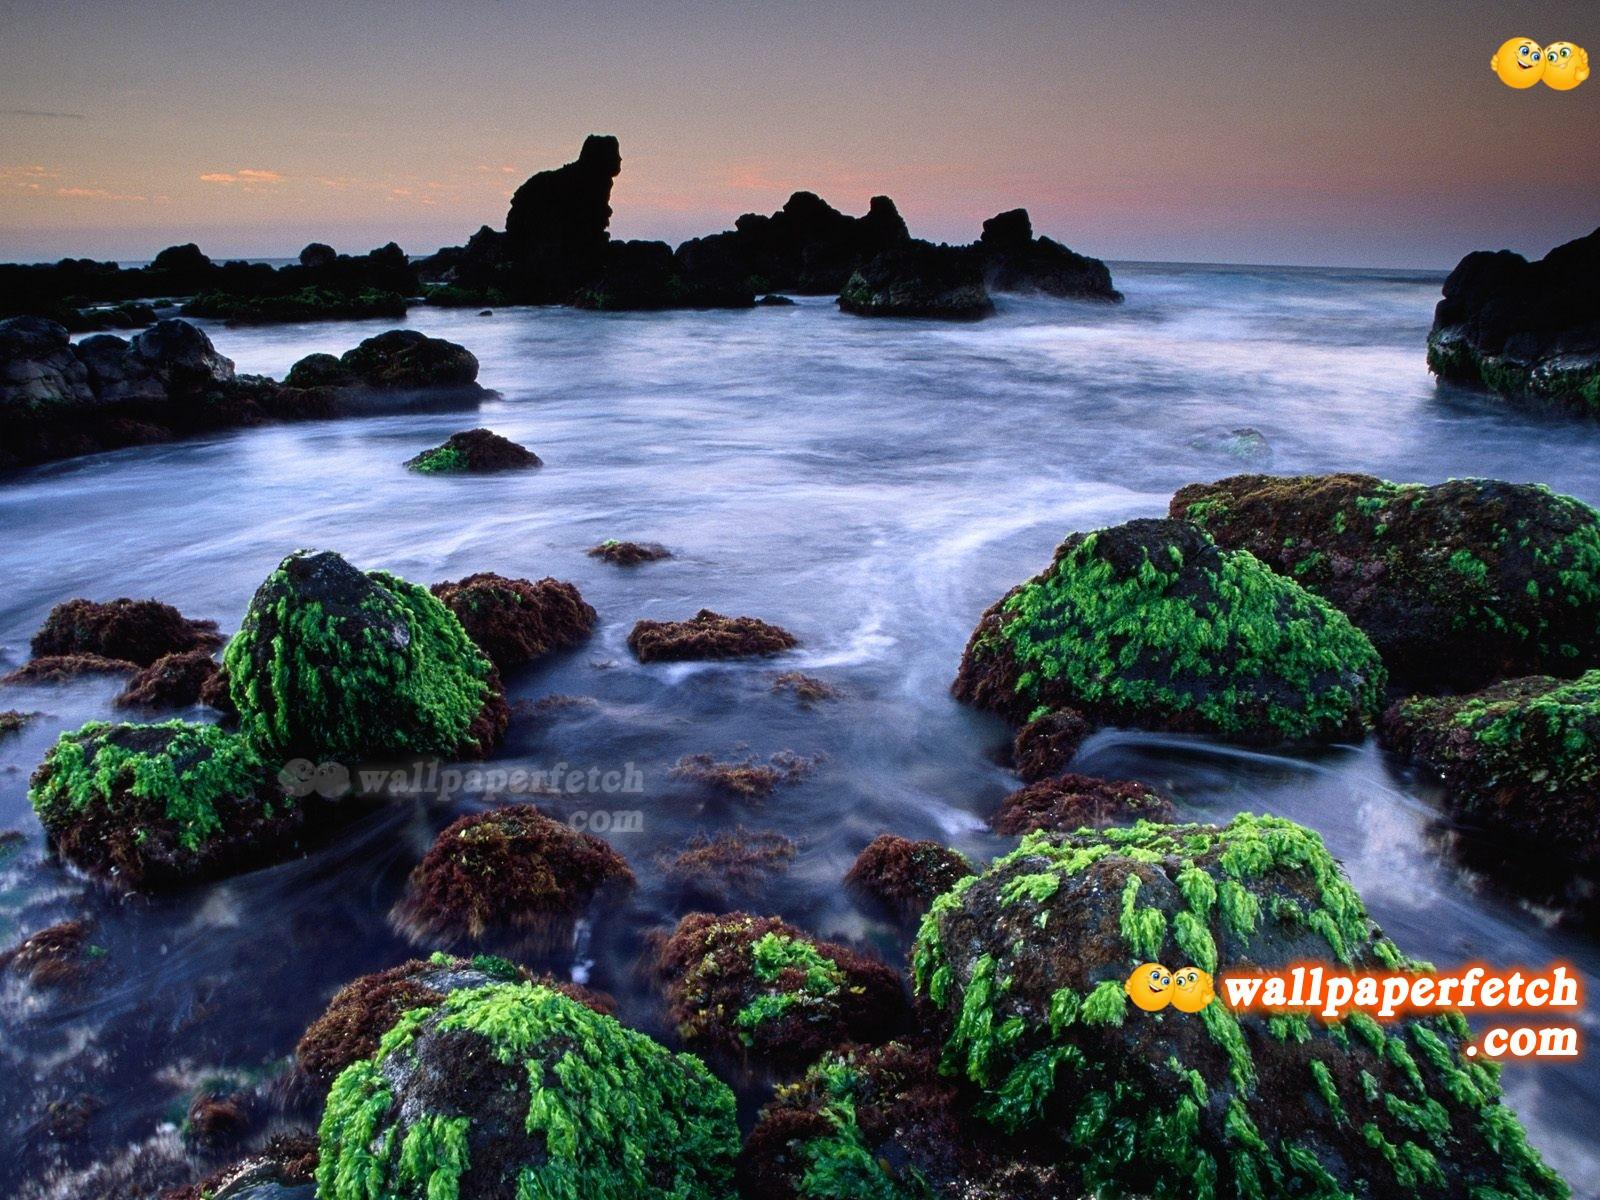 http://4.bp.blogspot.com/-ZndWyTN7HnM/T6QH5iC7-rI/AAAAAAAALEw/CNyrmp3OBgE/s1600/Hookipa_Seascape_Maui_Hawaii_Wallpaper_1600x1200_wallpaperhere.jpg